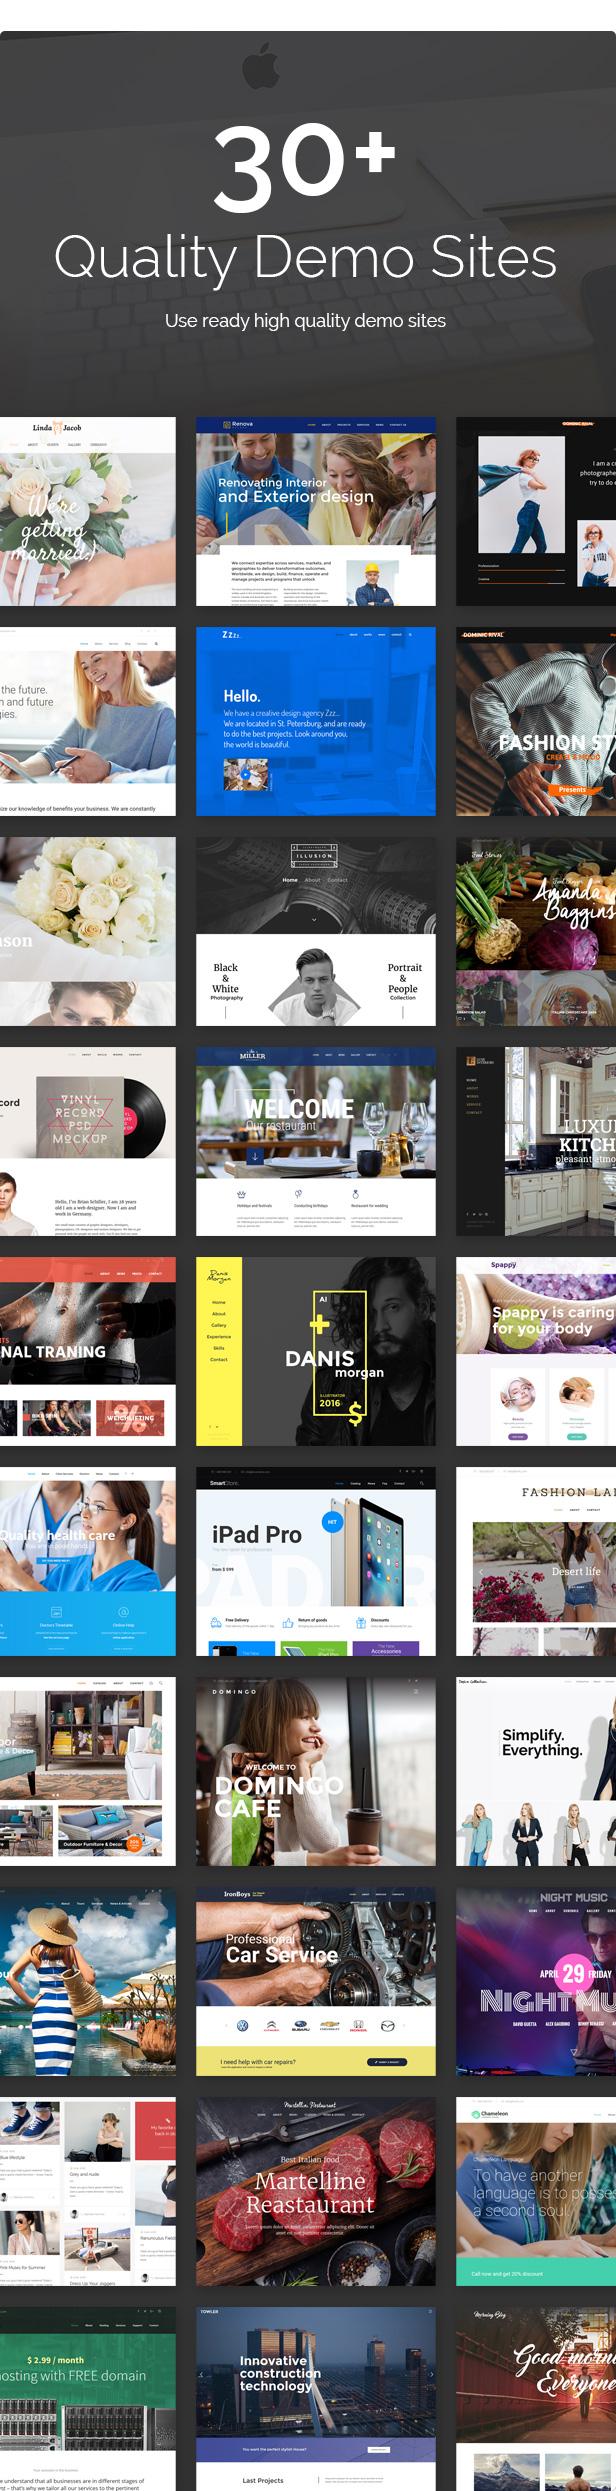 Firefly - Responsive Multi-Purpose WordPress Theme - 3